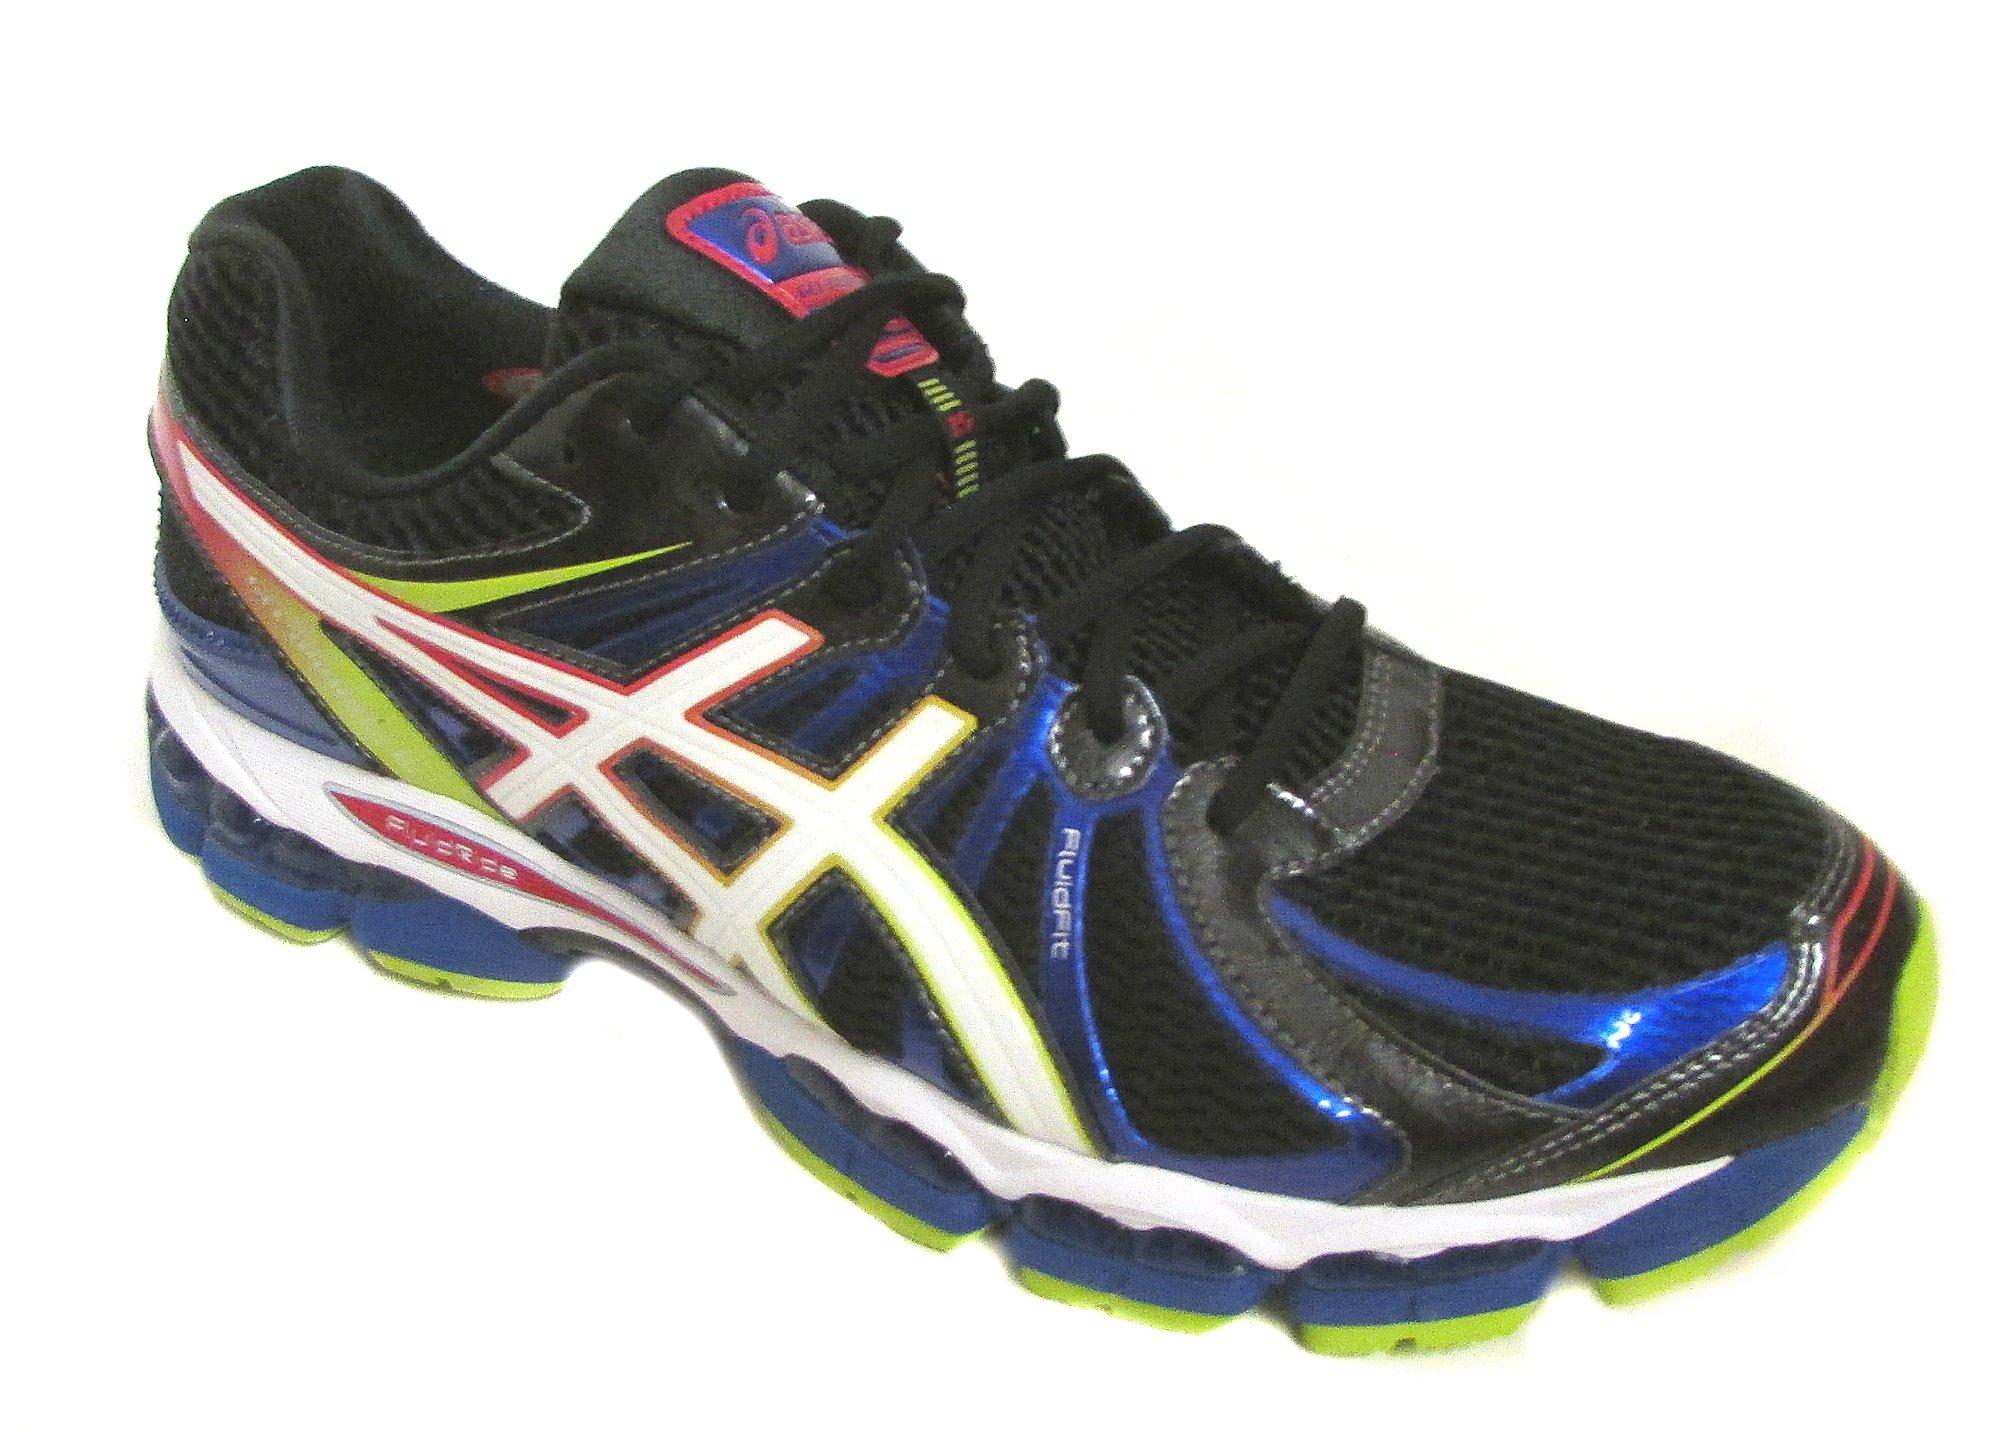 asics s gel nimbus 15 running shoes us sizes ebay